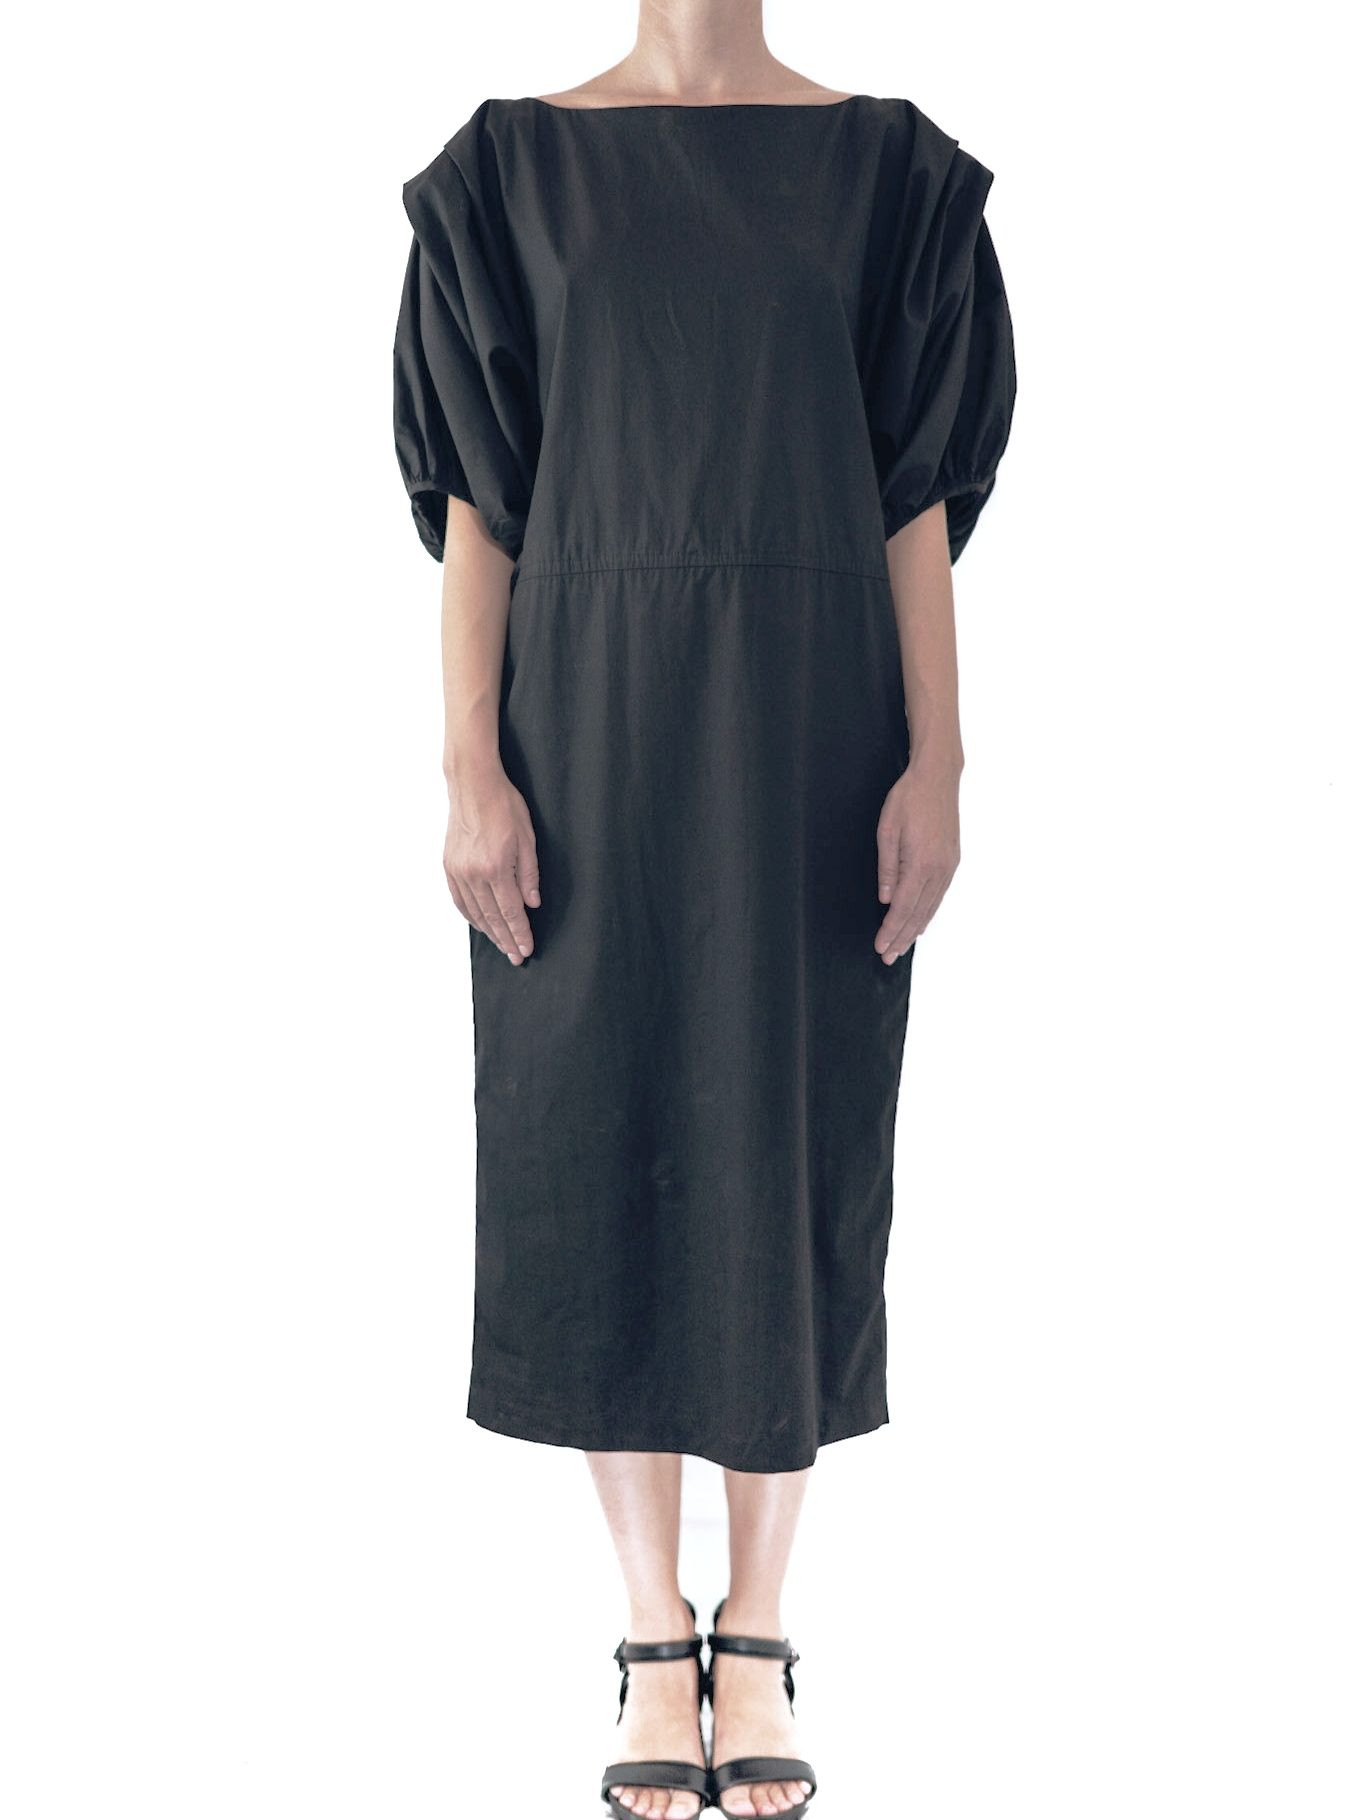 19.0.18 DB - DRESS : SLEEVE  FABRIC: 100% COTTON  SIZE: S / M / L  COLOR: BLACK / WHITE